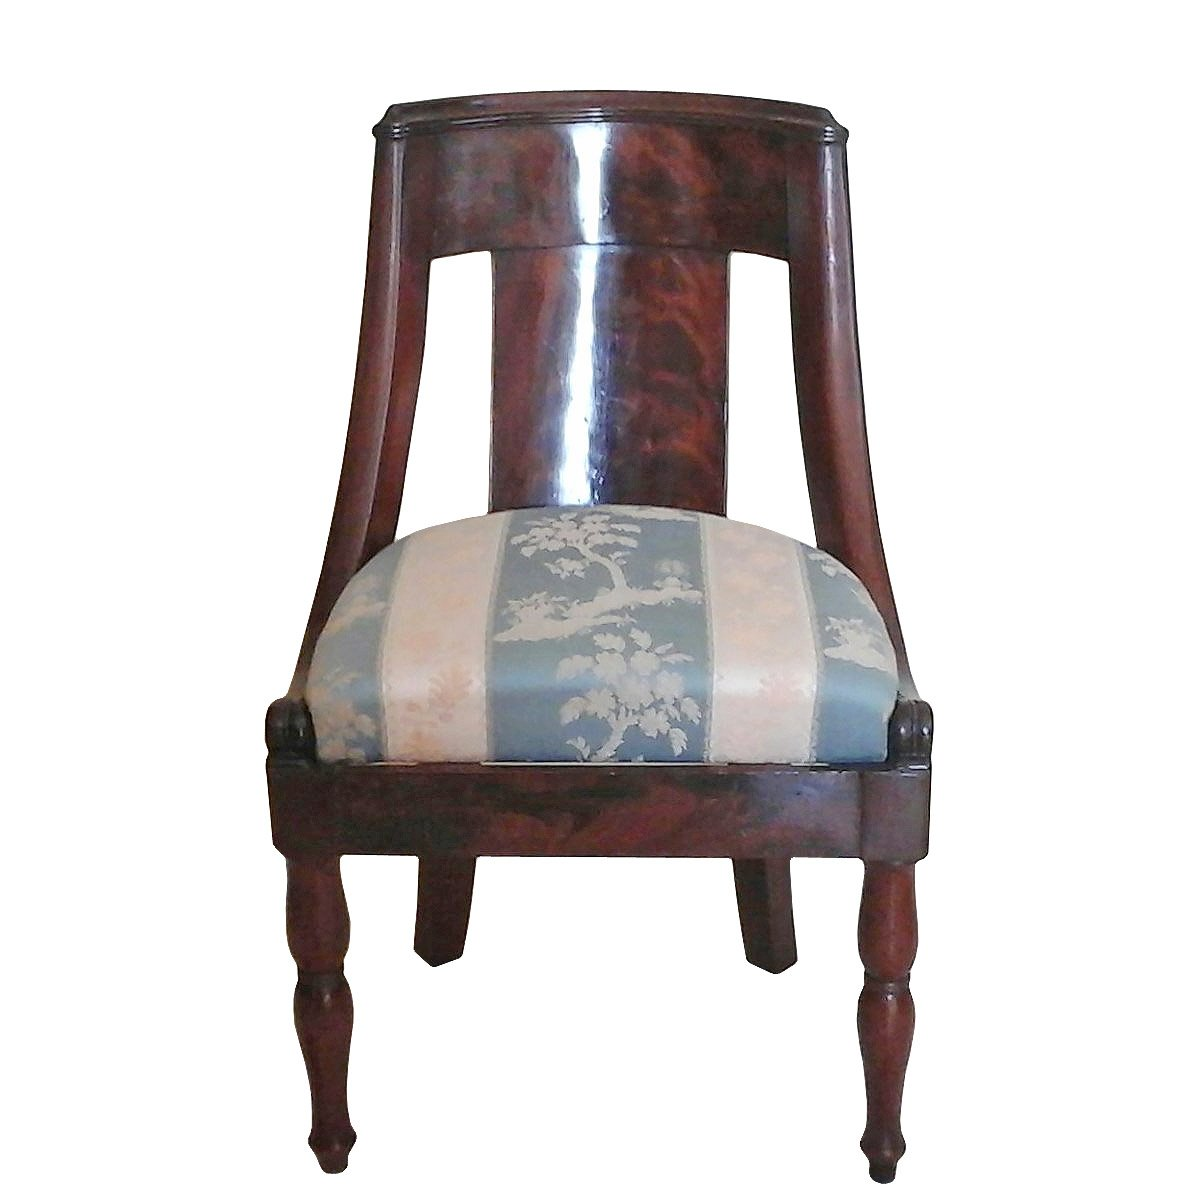 chaise d 39 enfant charles x xixe si cle. Black Bedroom Furniture Sets. Home Design Ideas